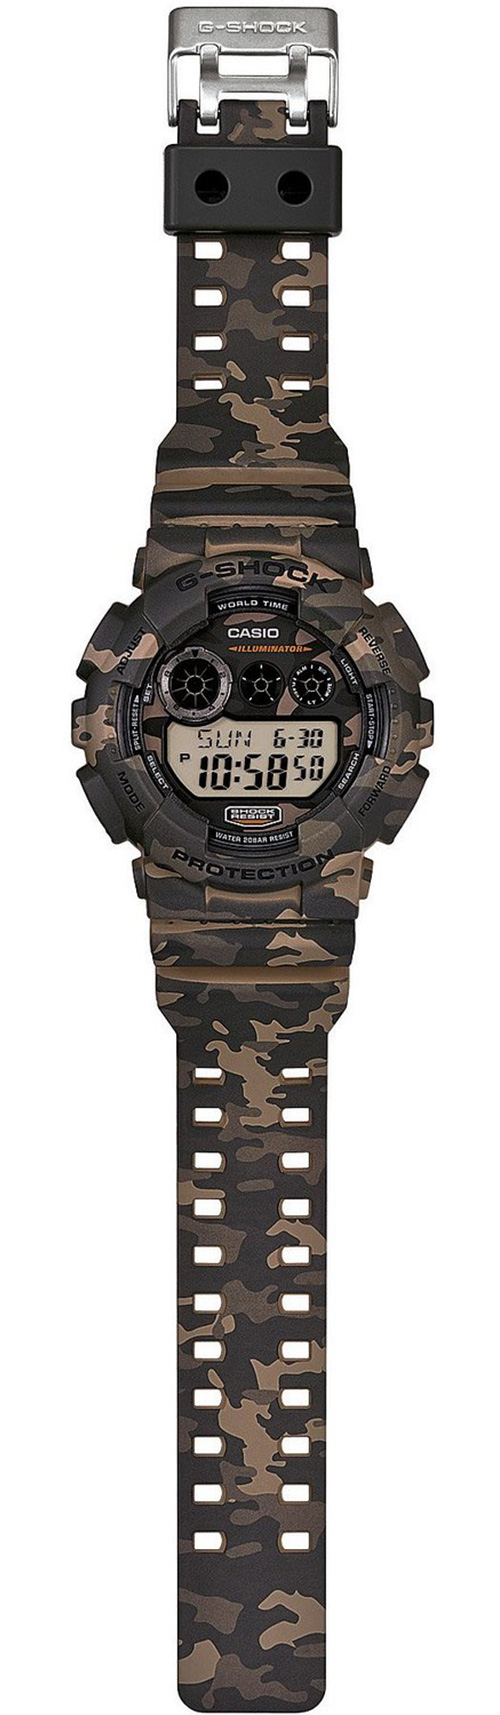 gs120cm-5_g-shock_full woods camo watch